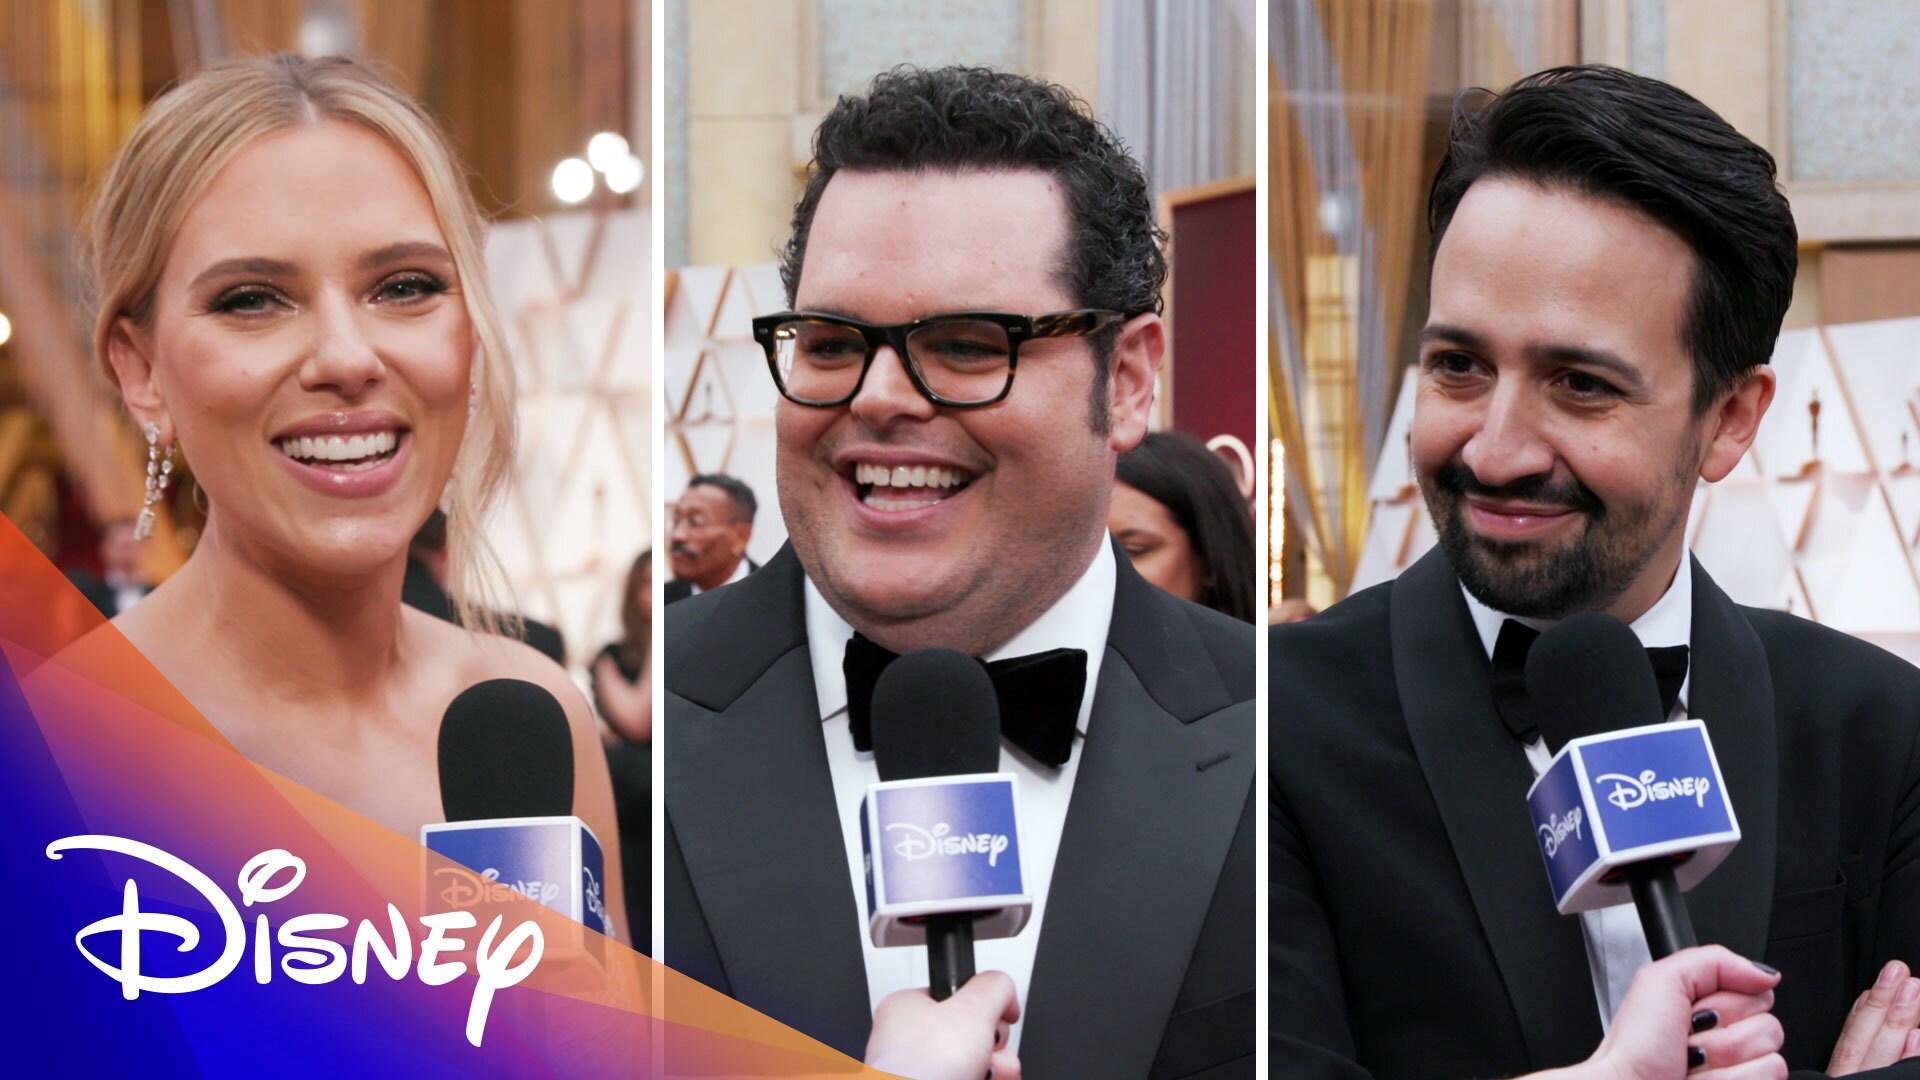 Disney at the 2020 Oscars | Disney